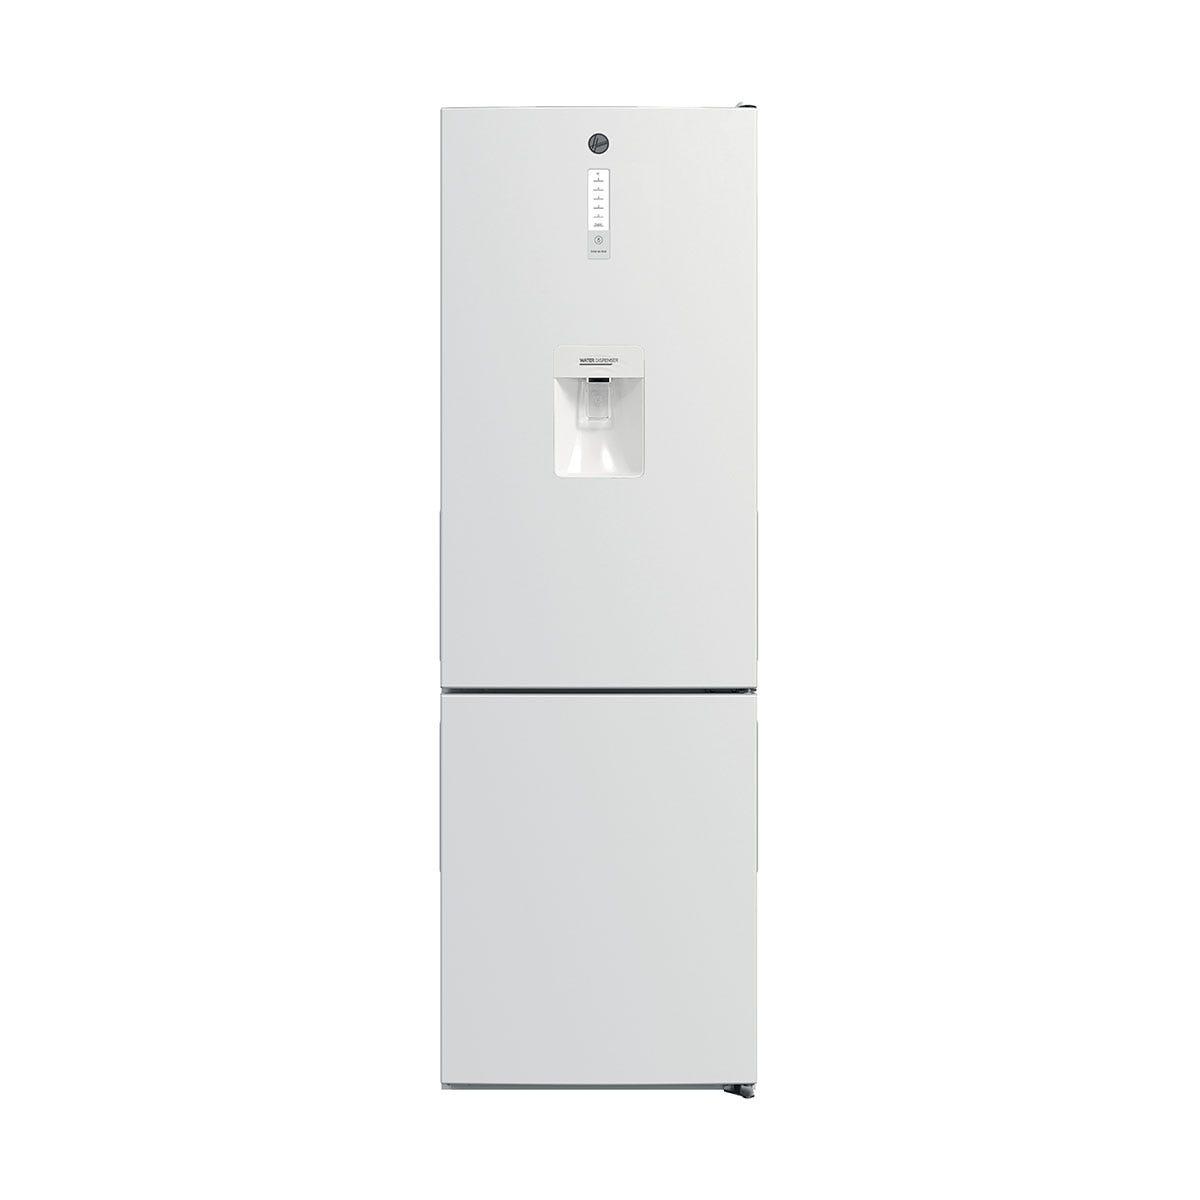 Hoover HMDNV 6184WWDK 60cm 300L Total No Frost Fridge Freezer - White